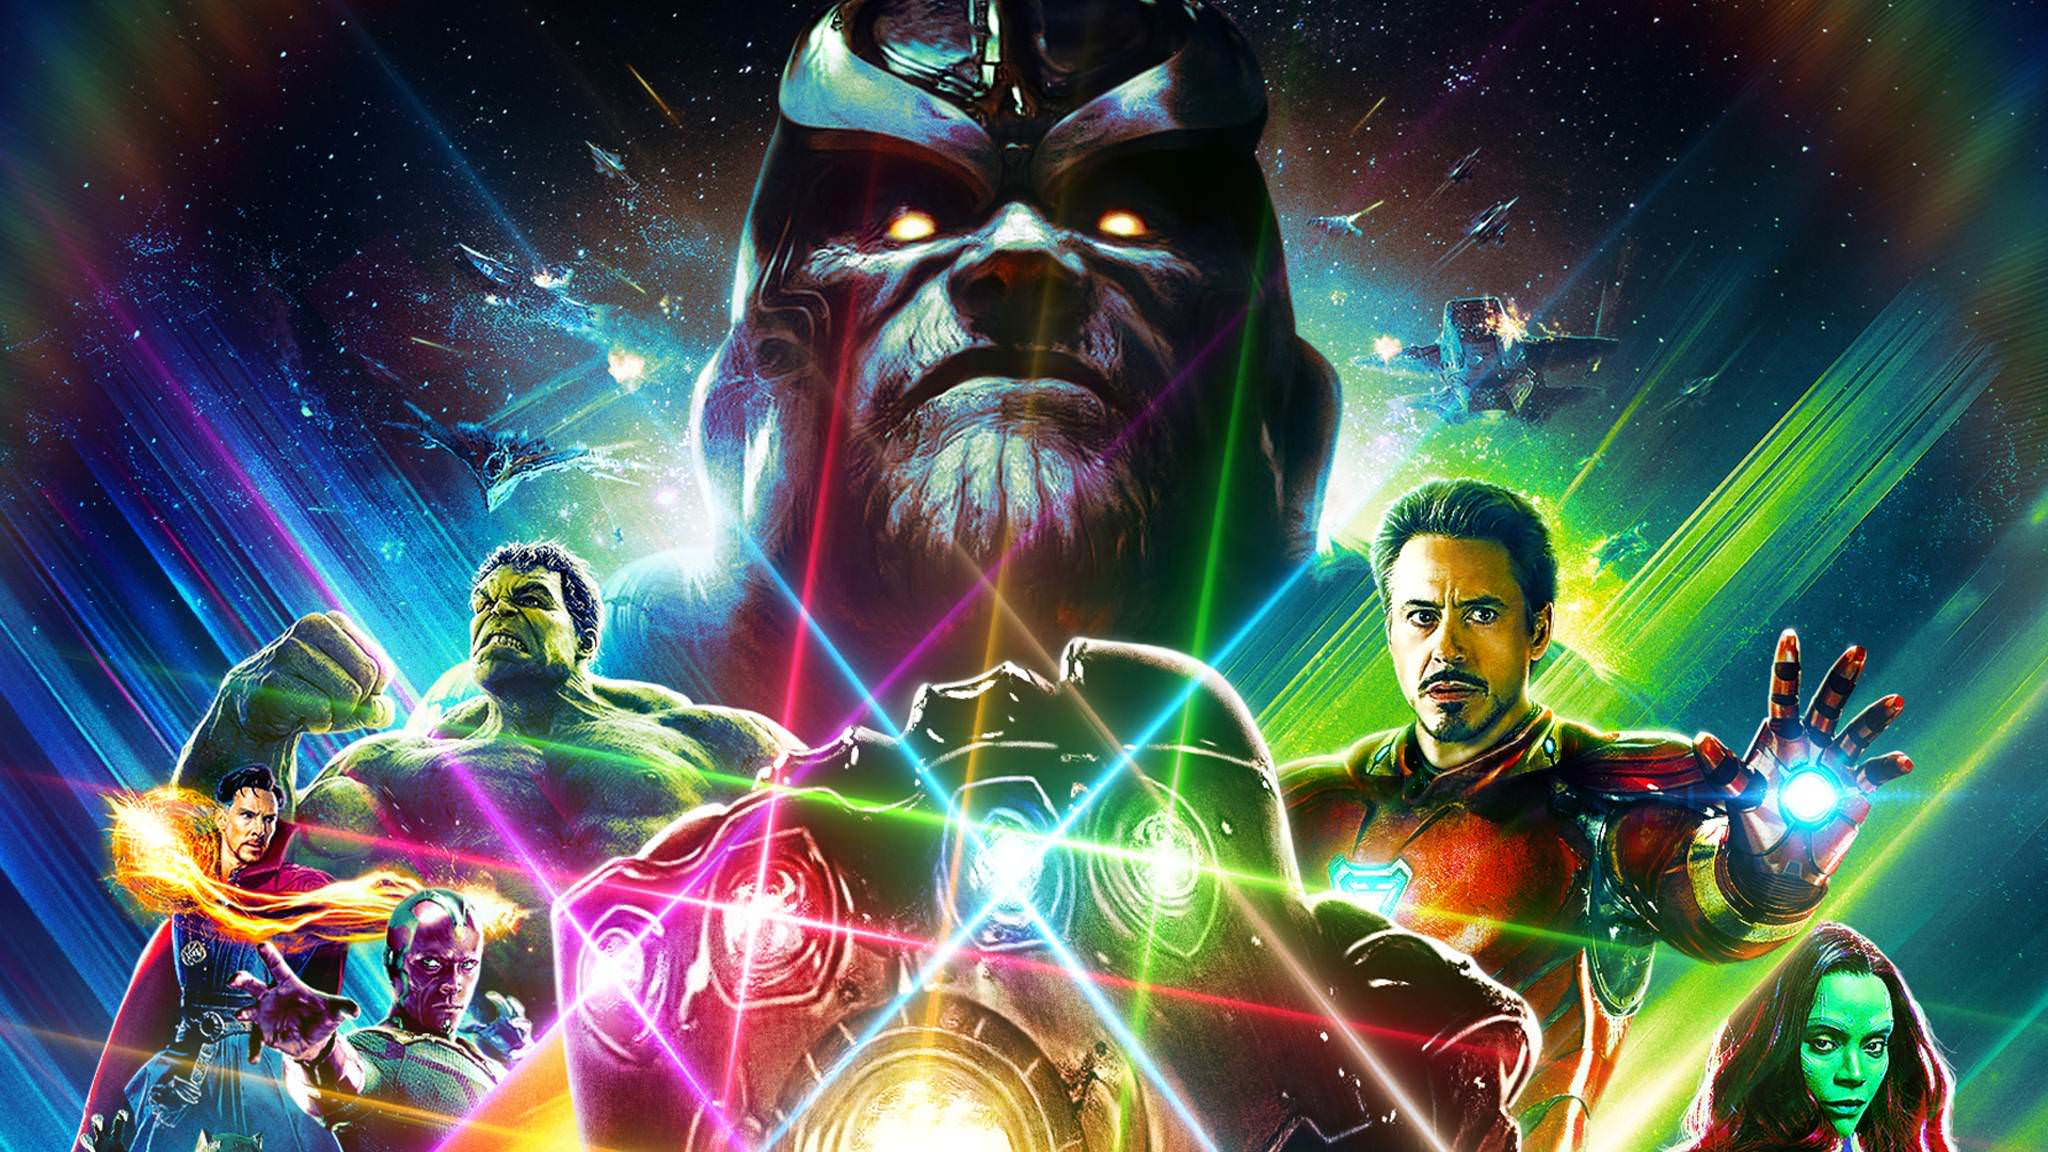 45 Best Free Avengers Infinity War 4k Wallpapers Wallpaperaccess